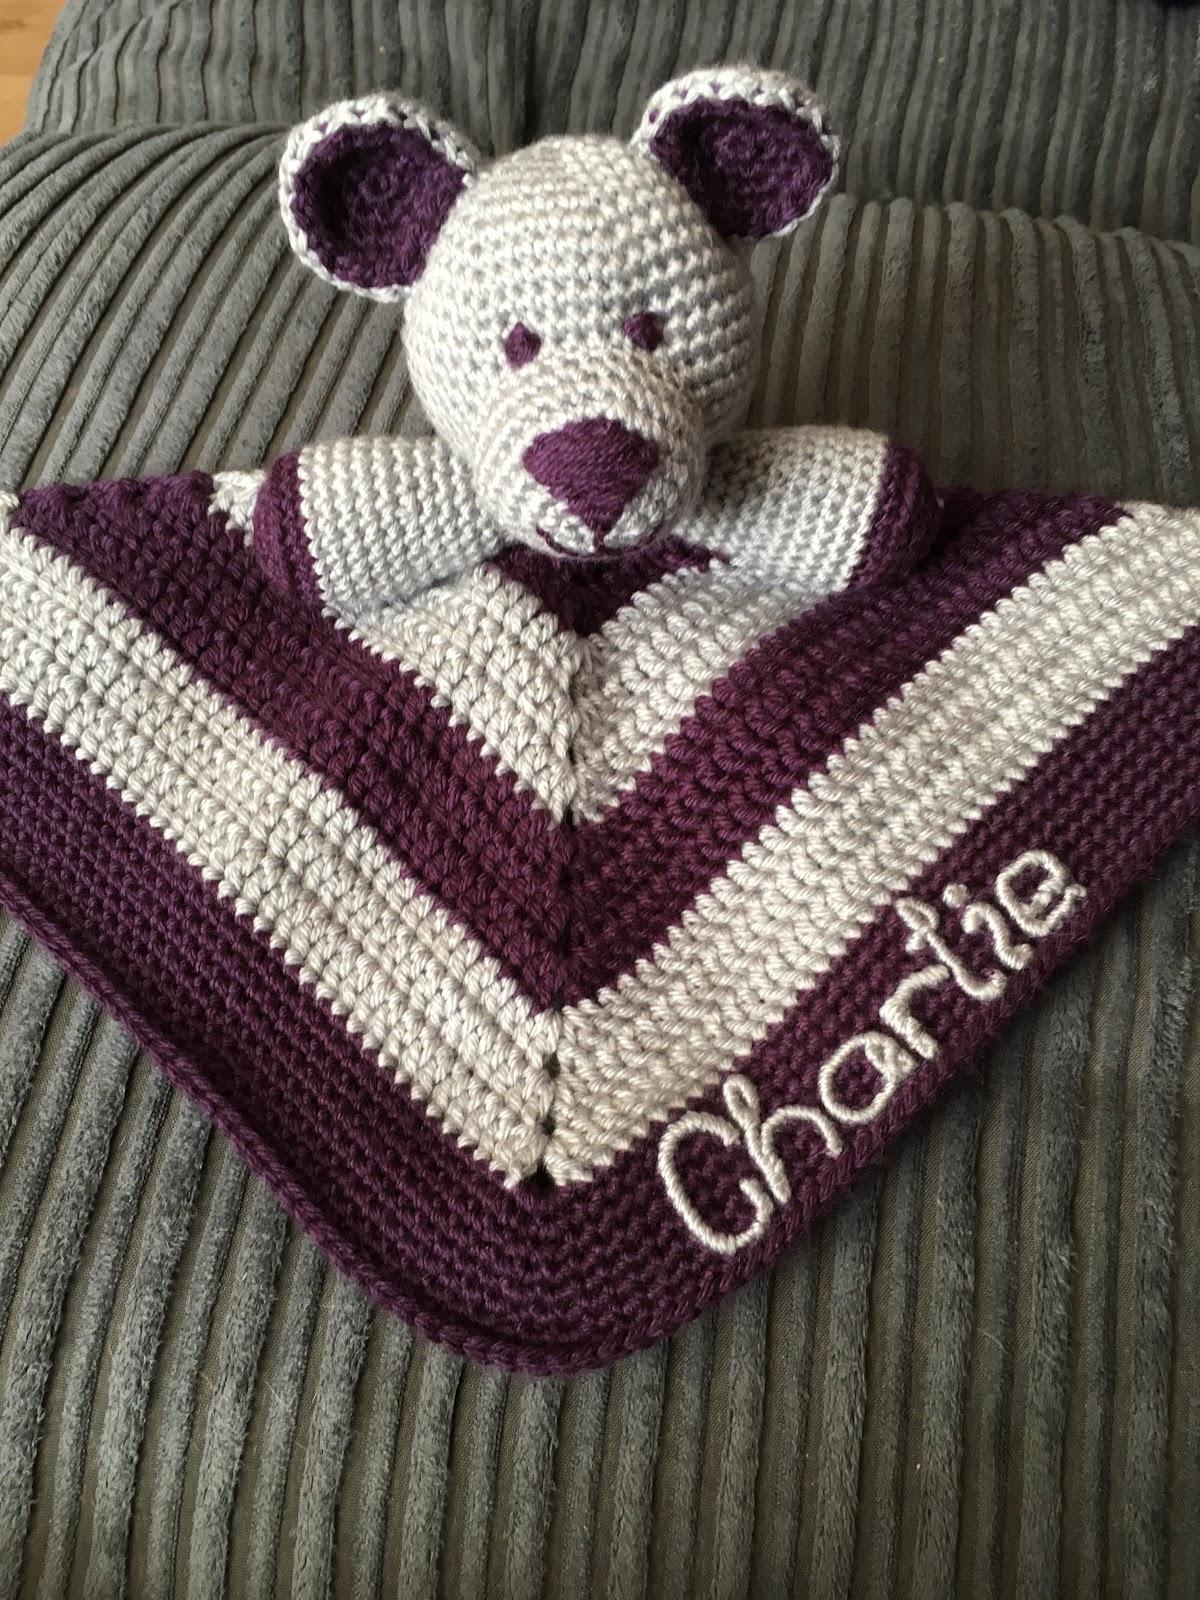 Diddy the Teddy Blanket - Free Crochet Pattern